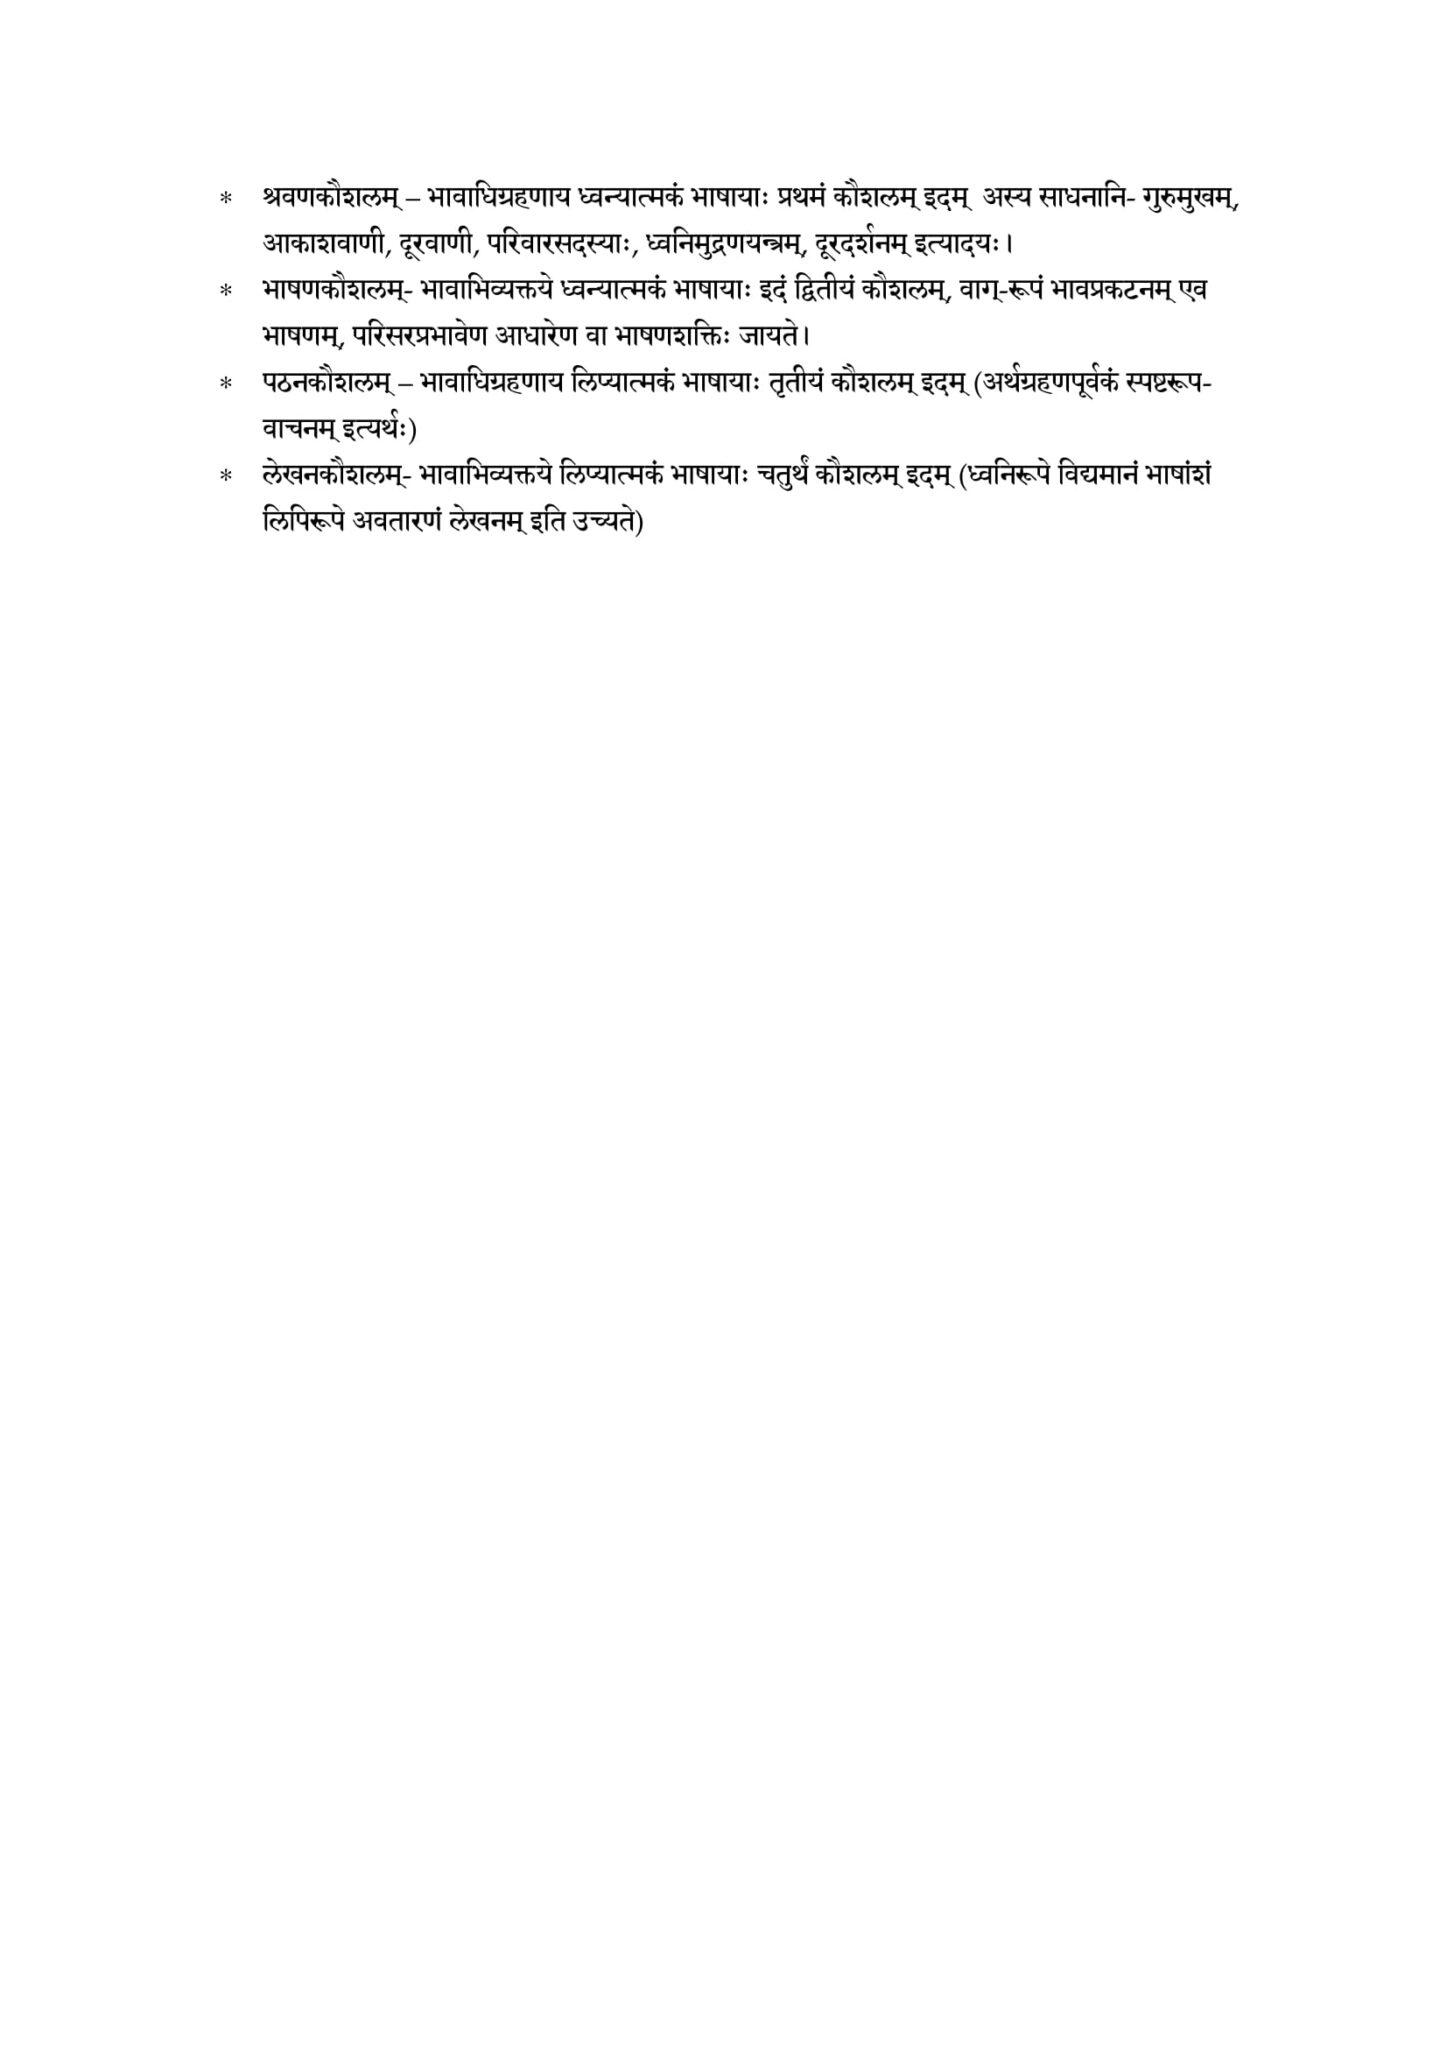 Sanskrit Sec 2020 21 class 9 10 03 1